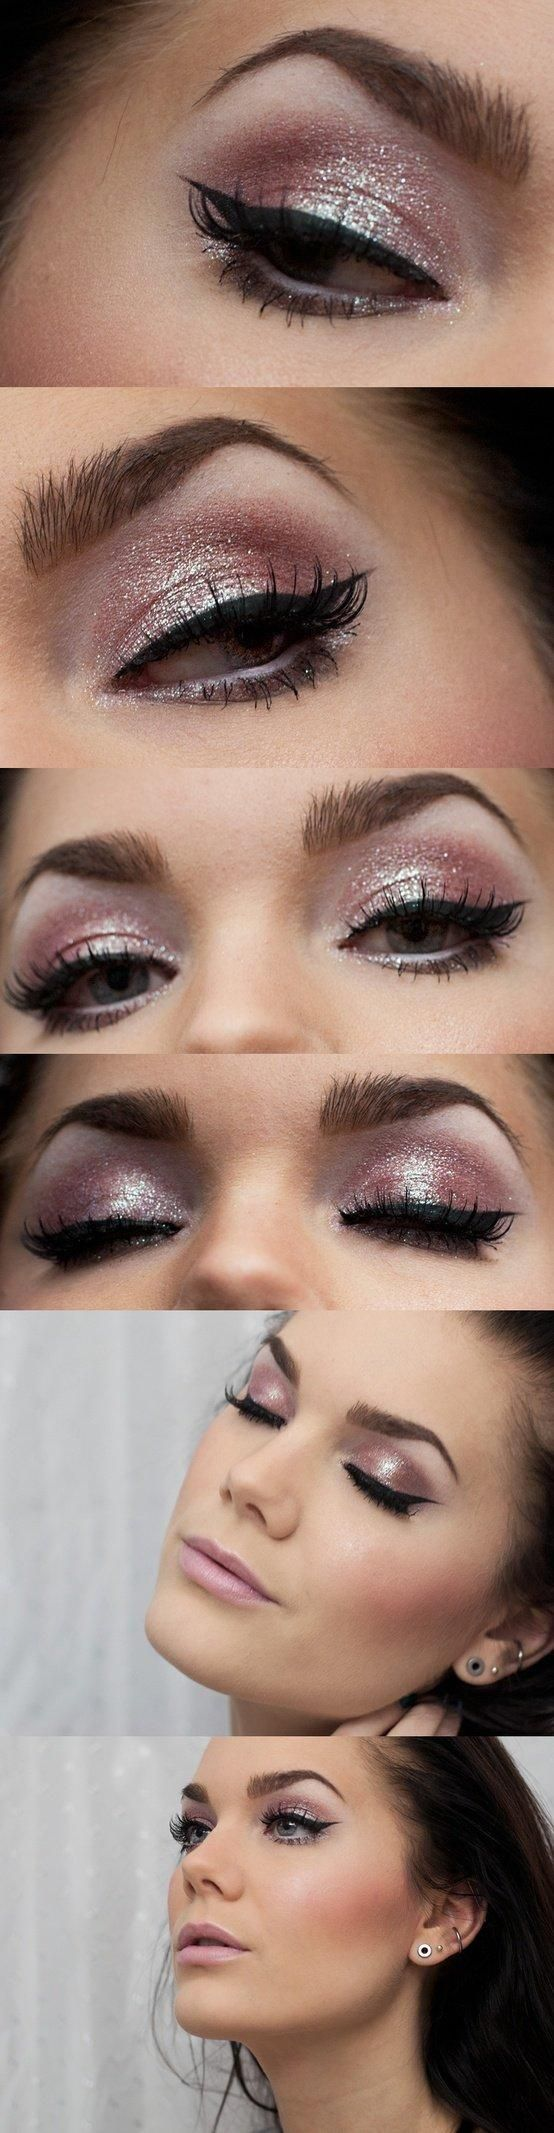 "Check out rana sultan's ""amazingggggggggg makeup "" Decalz @Lockerz"